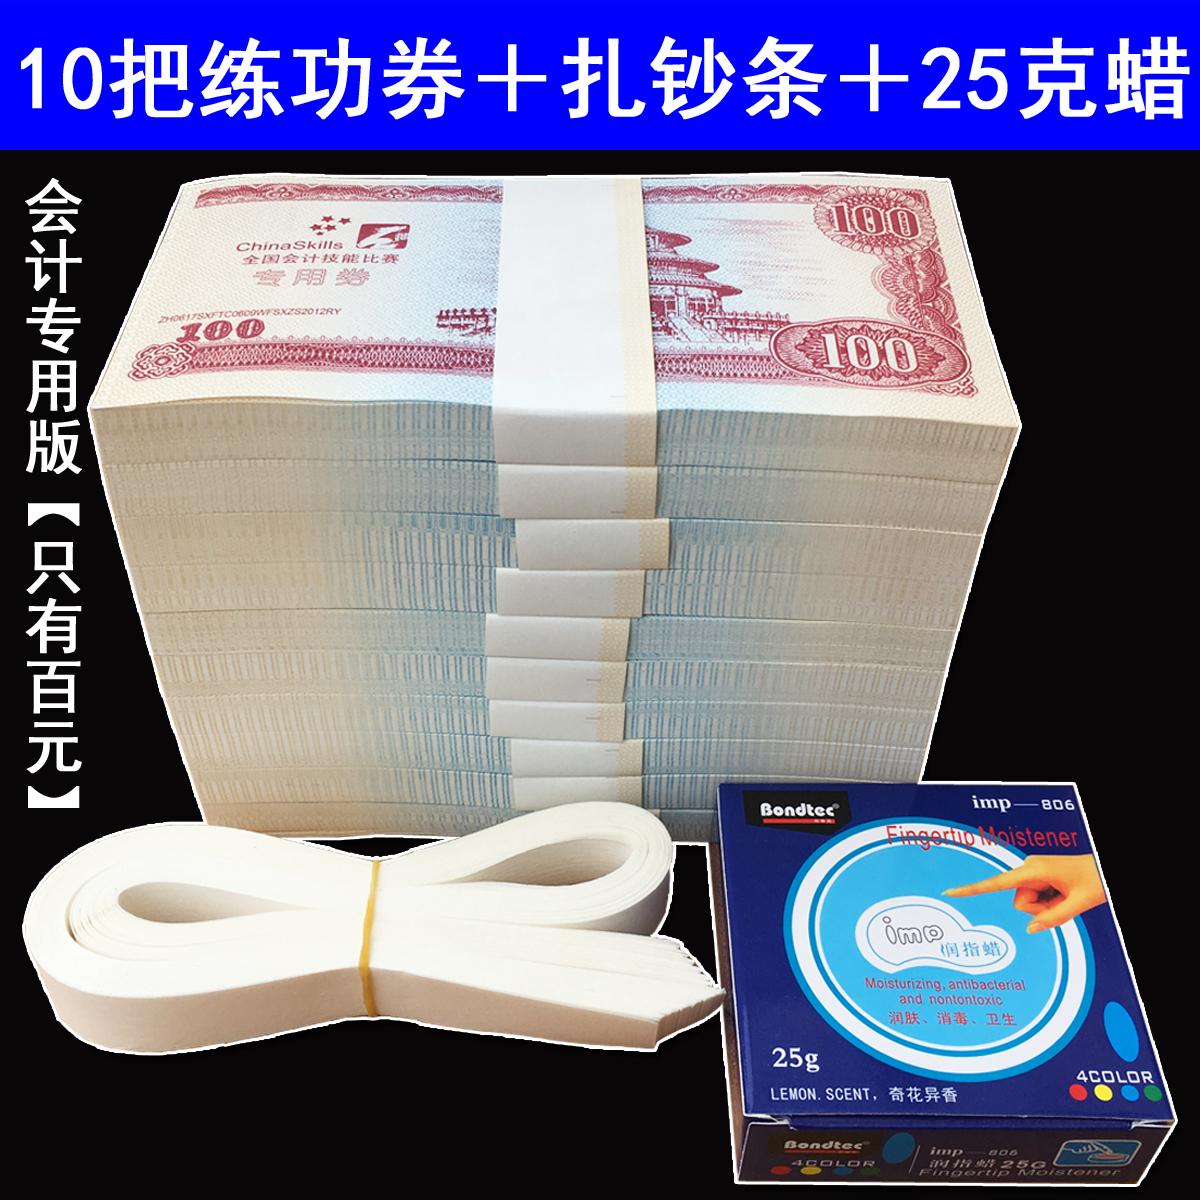 Китайские деньги Артикул 598519059363